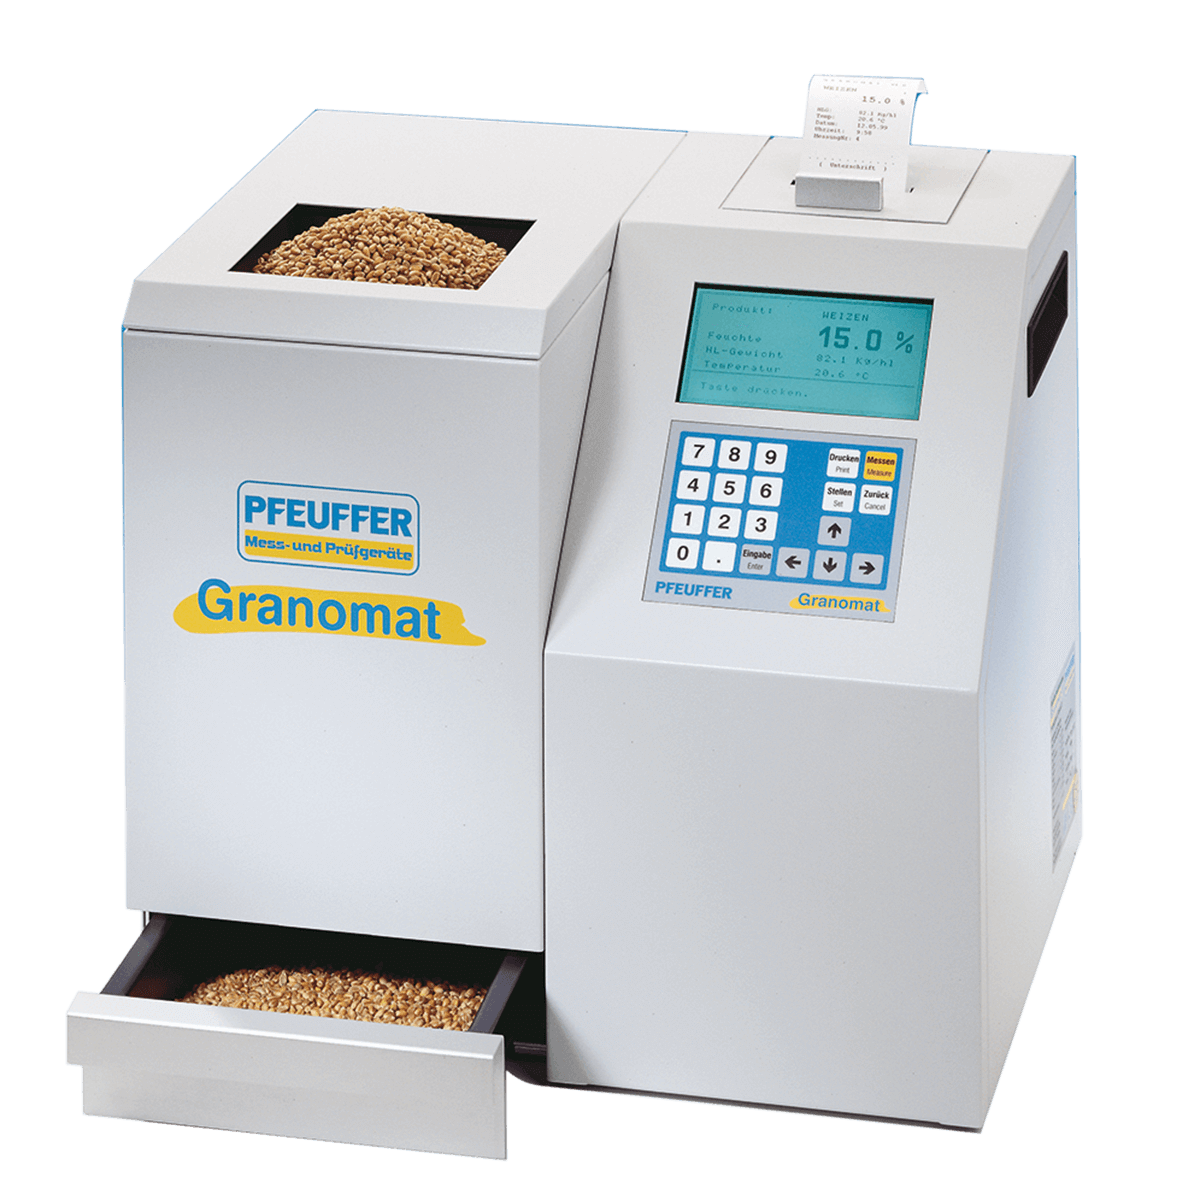 Анализатор влажности, температуры и натурного веса Granomat